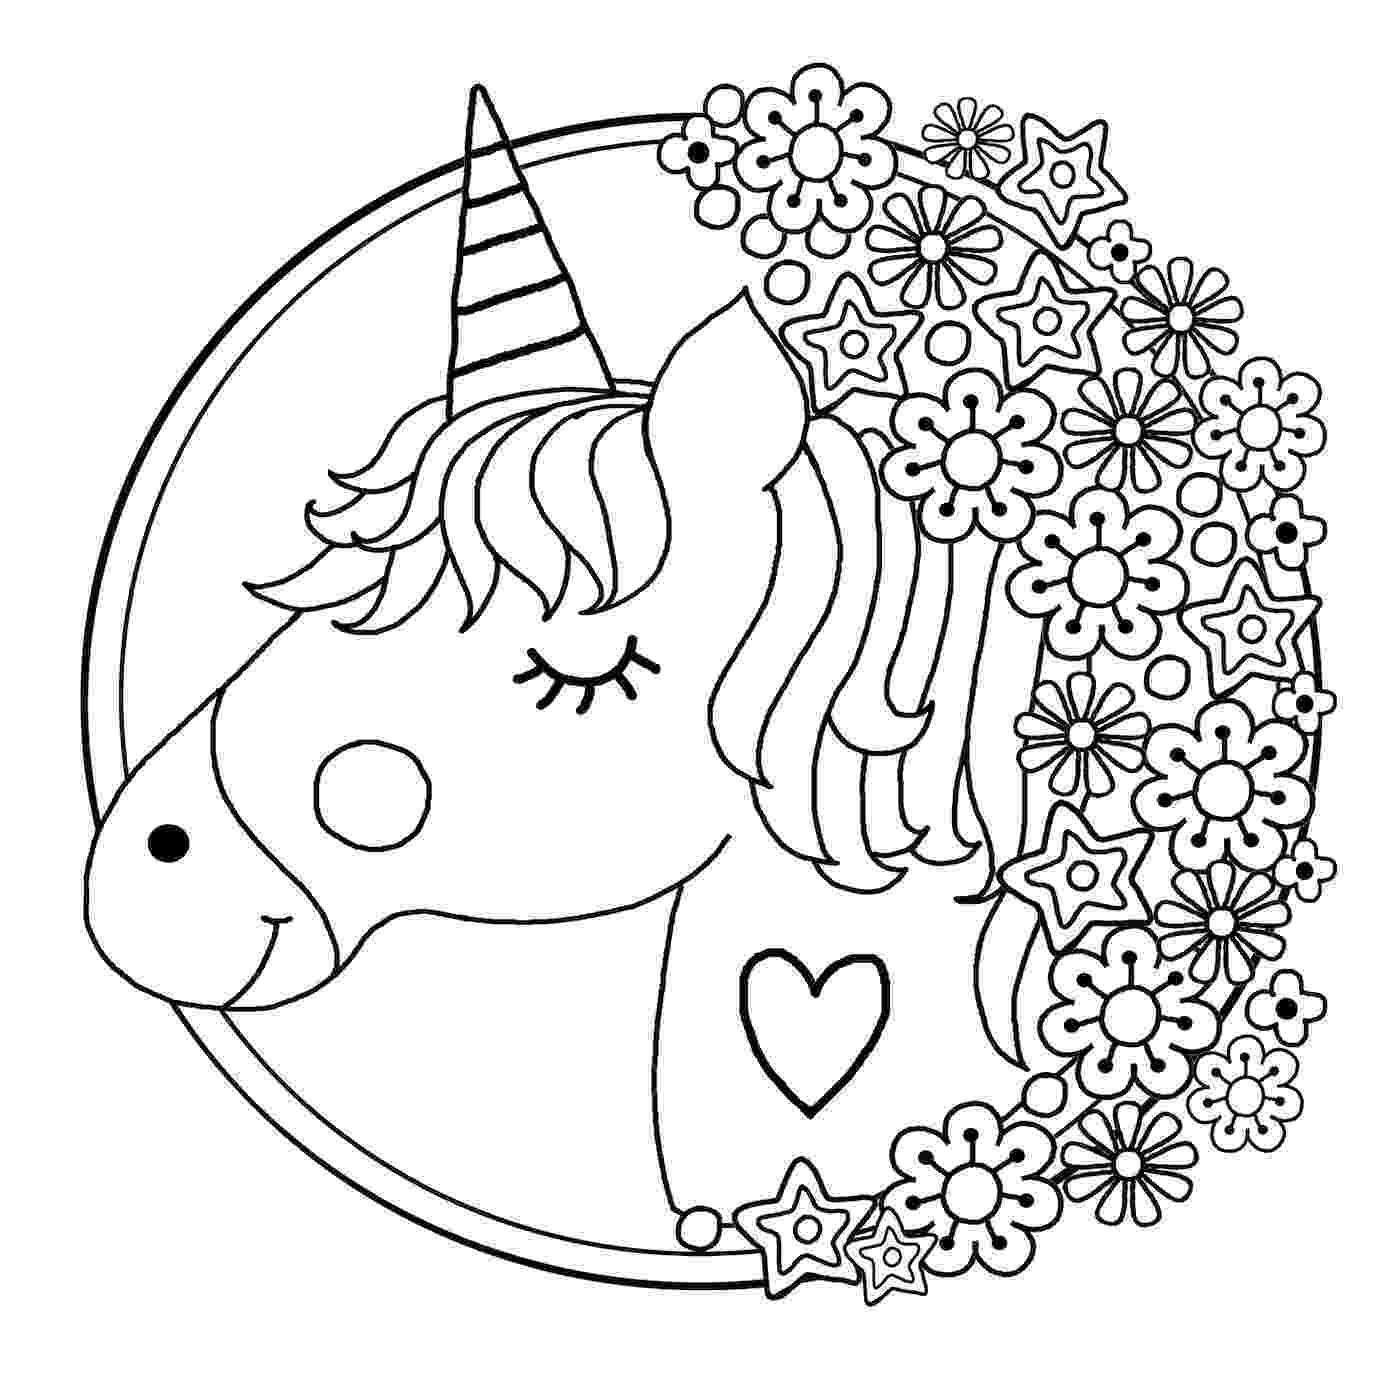 coloring page unicorn free printable unicorn coloring pages for kids unicorn coloring page 1 1